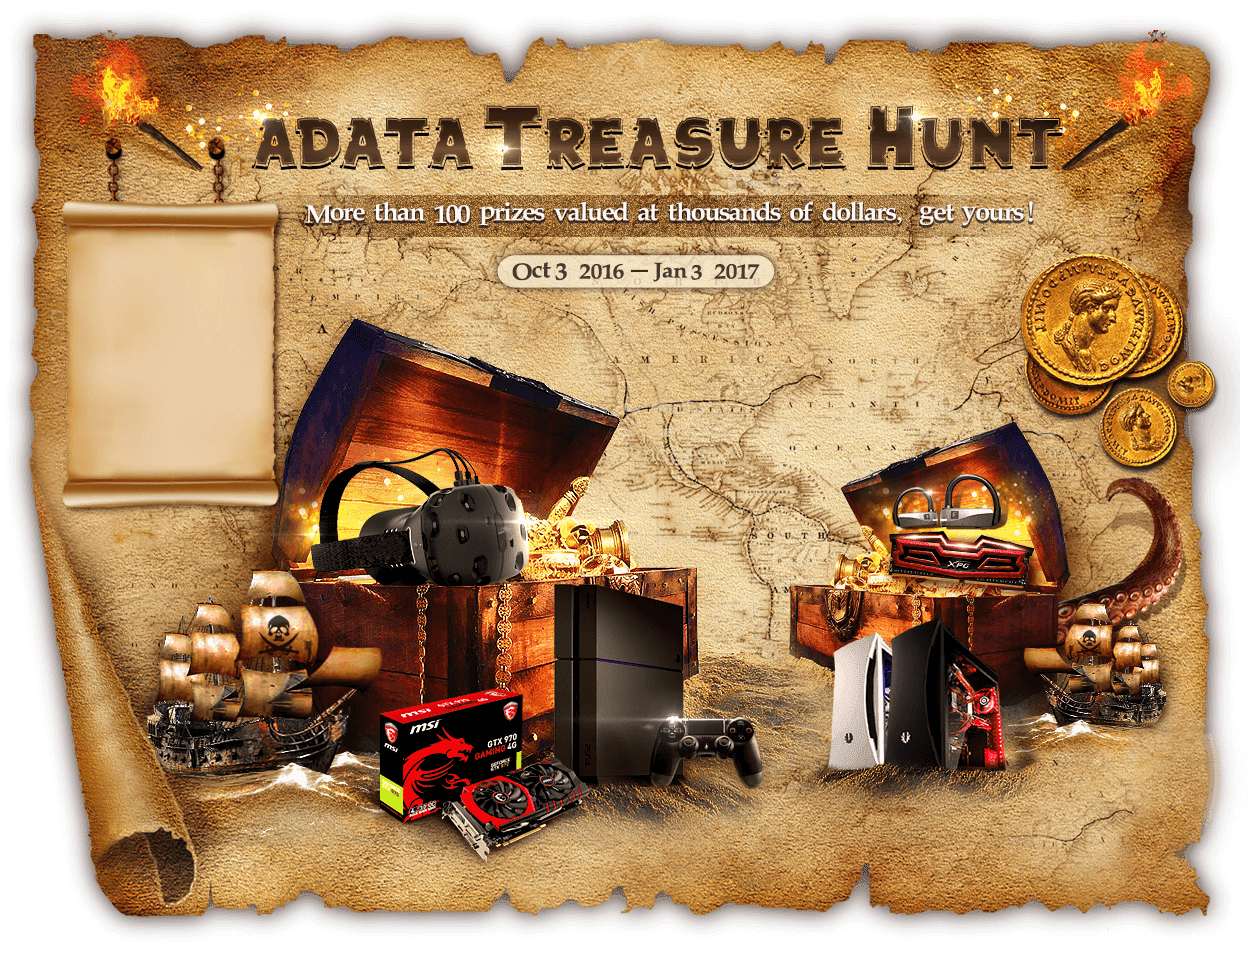 ADATA Treasure Hunt Promotional Campaign